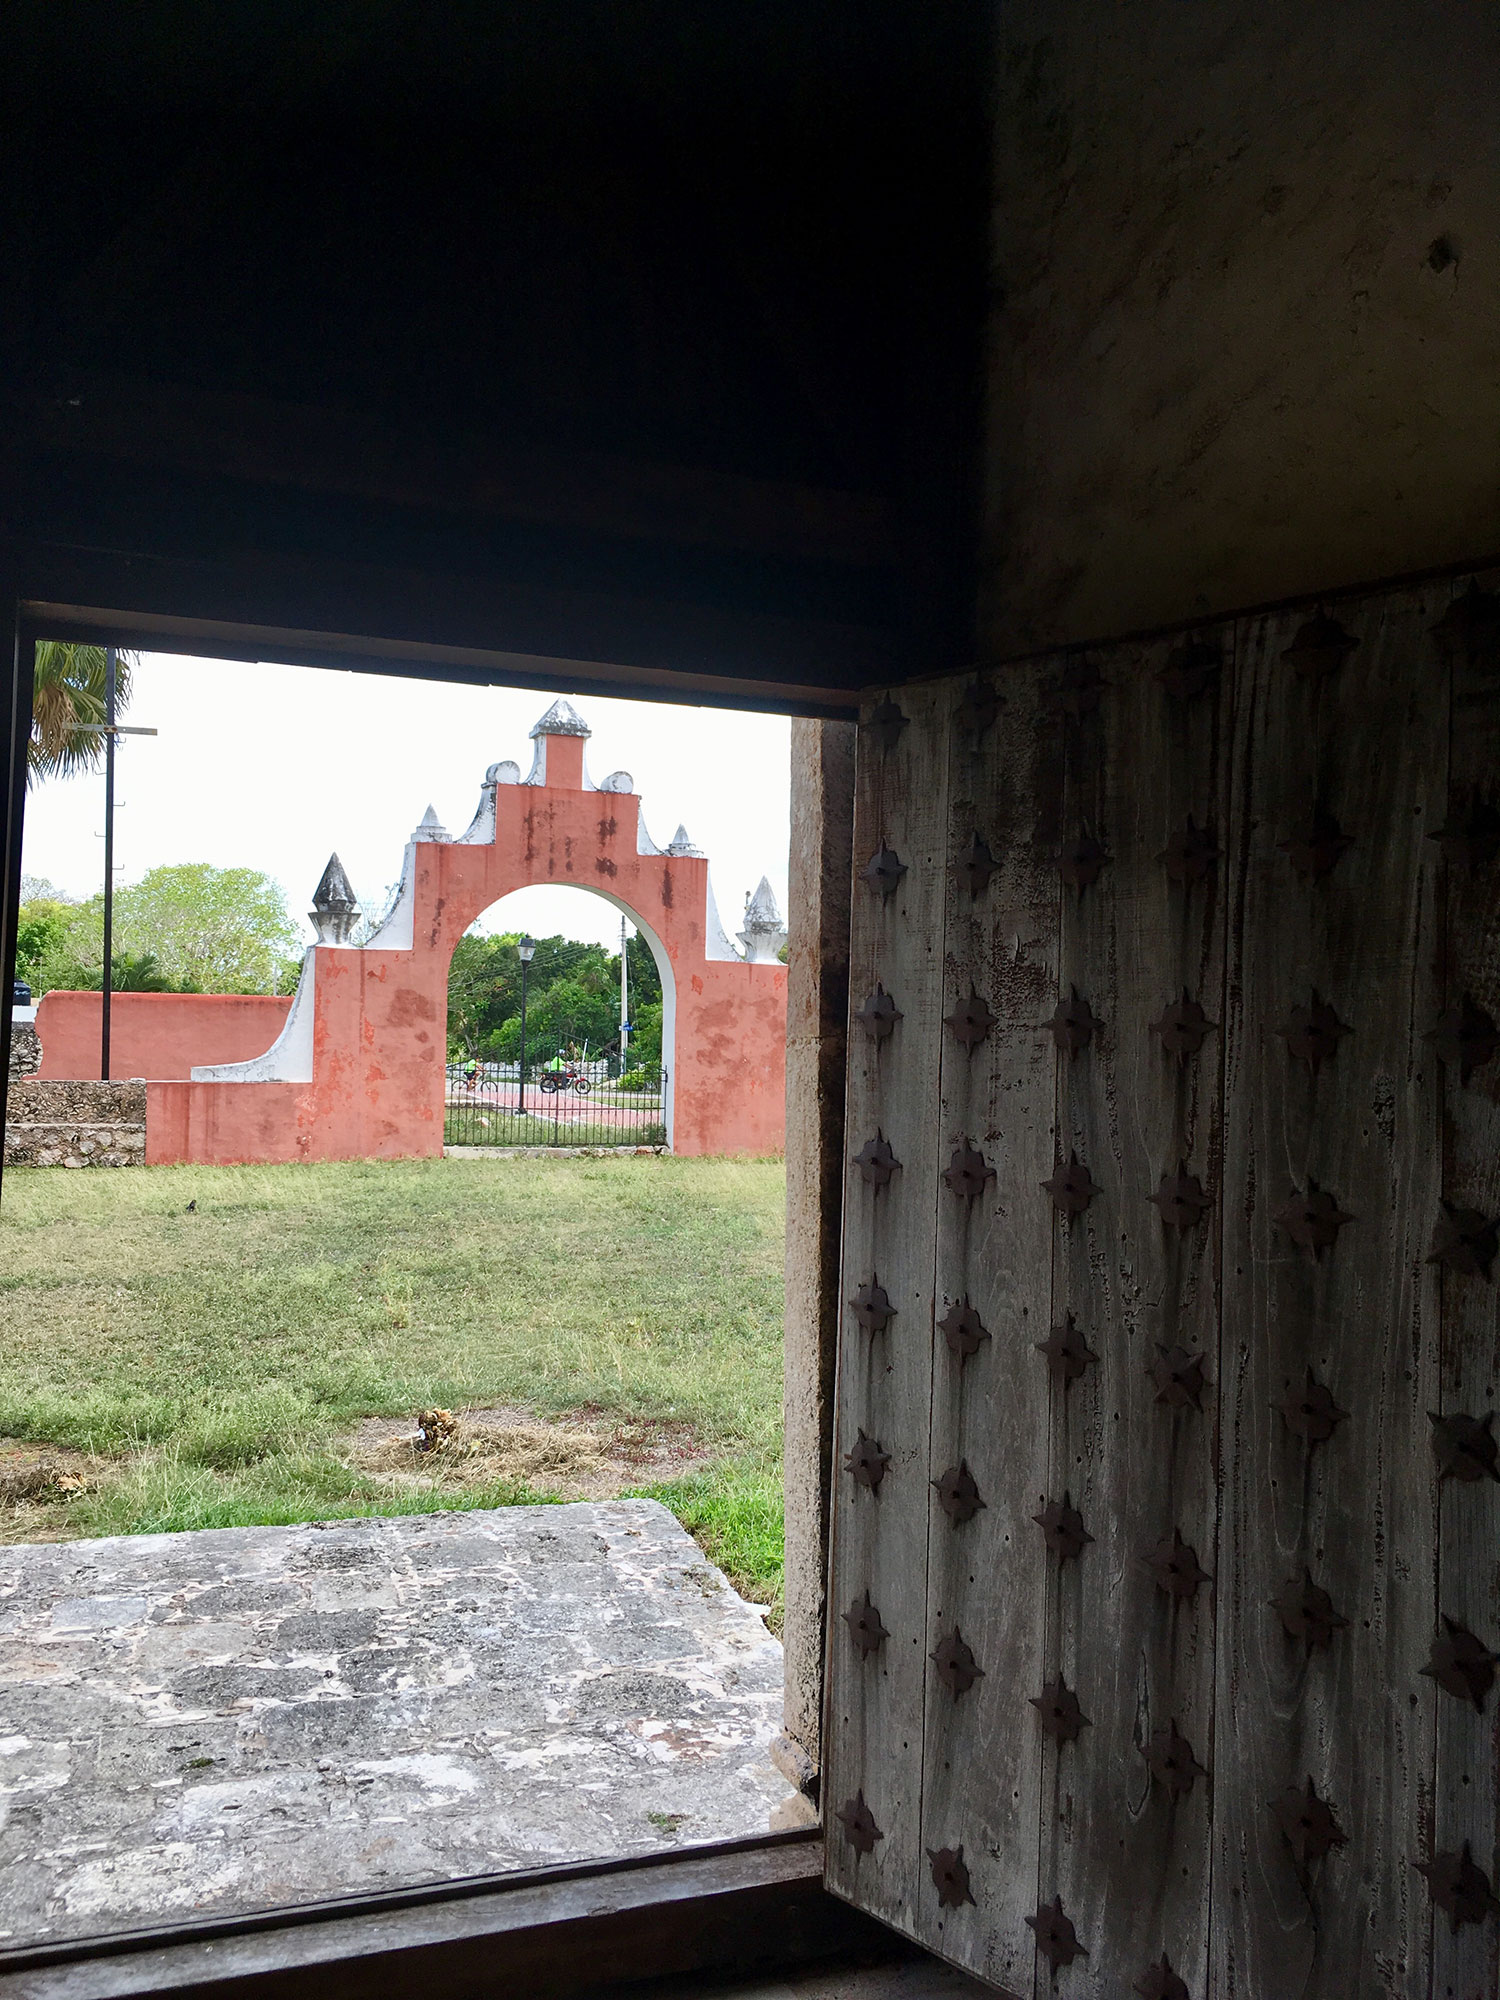 Hammocks_and_Ruins_What_to_Do_Mexico_Mayan_pyramid_town_Uayma_16.jpg